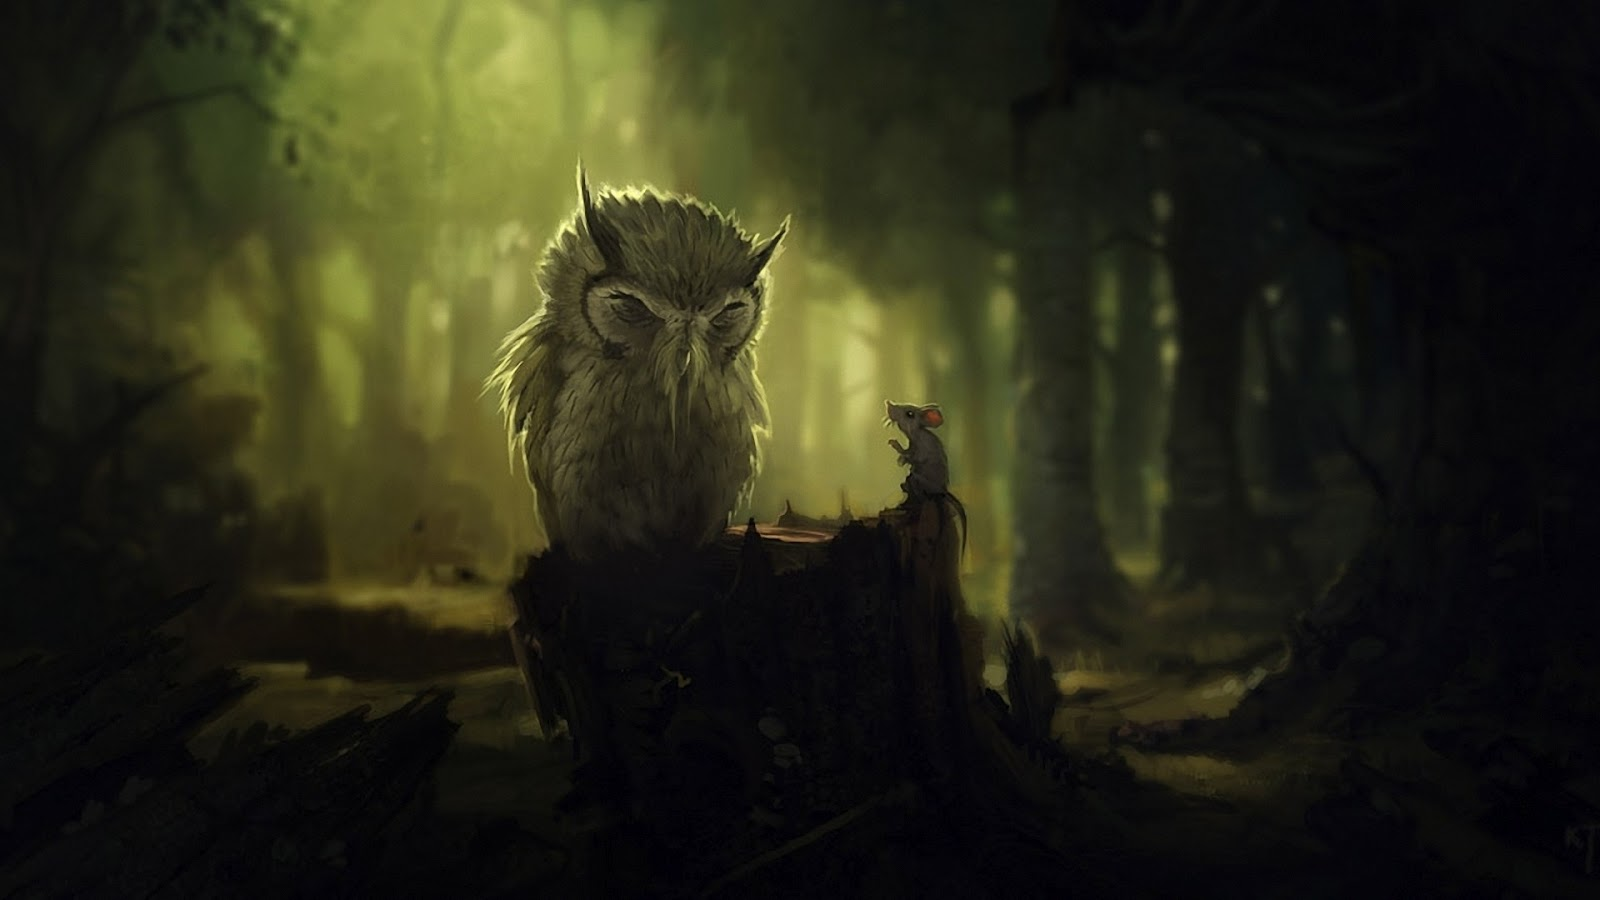 Desenhar / O Papel De Parede Do Design De Coruja Sábio - Fantasy Forest Animal Art , HD Wallpaper & Backgrounds